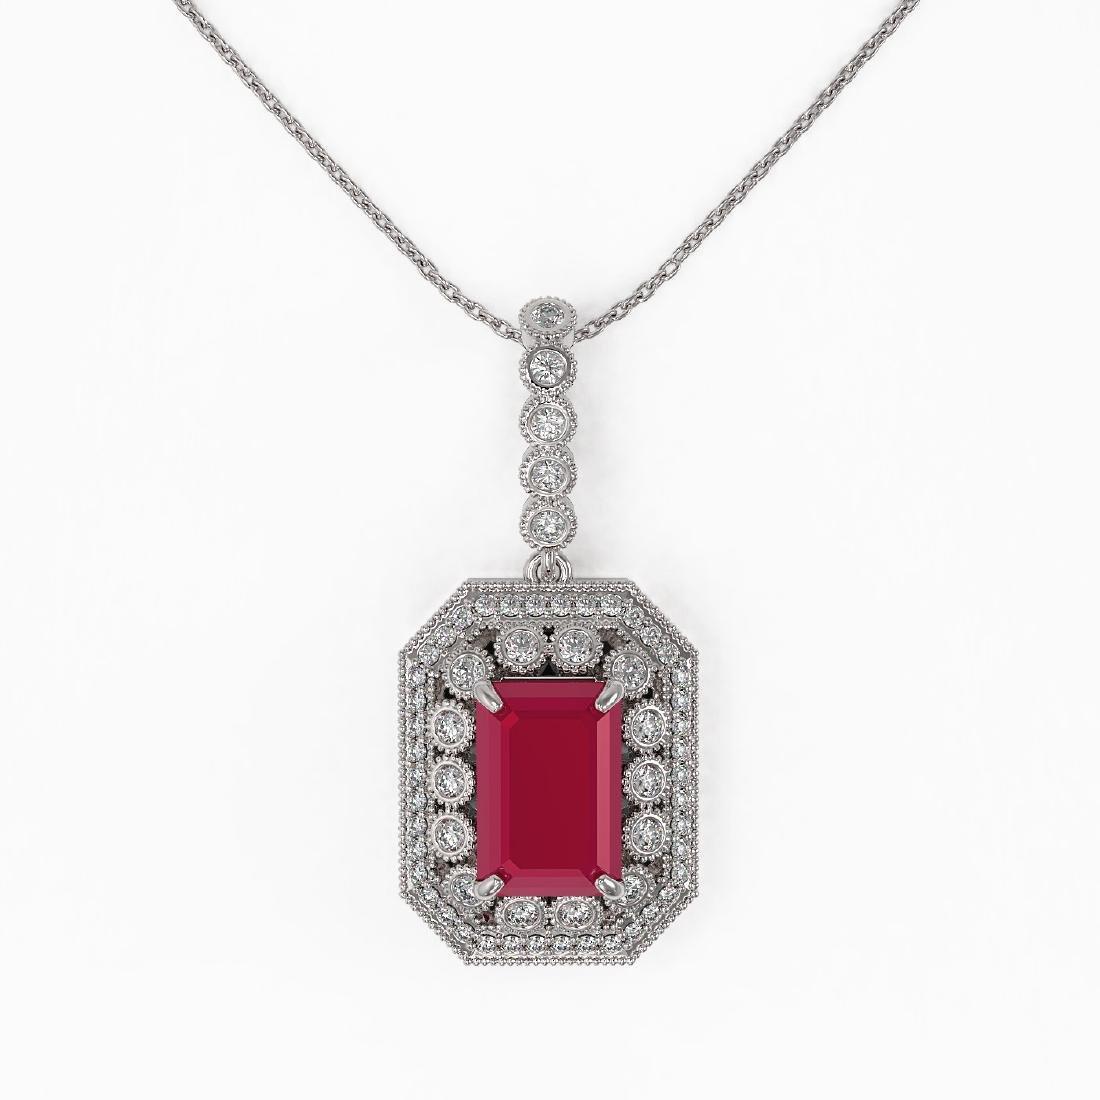 7.18 ctw Ruby & Diamond Necklace 14K White Gold - - 2